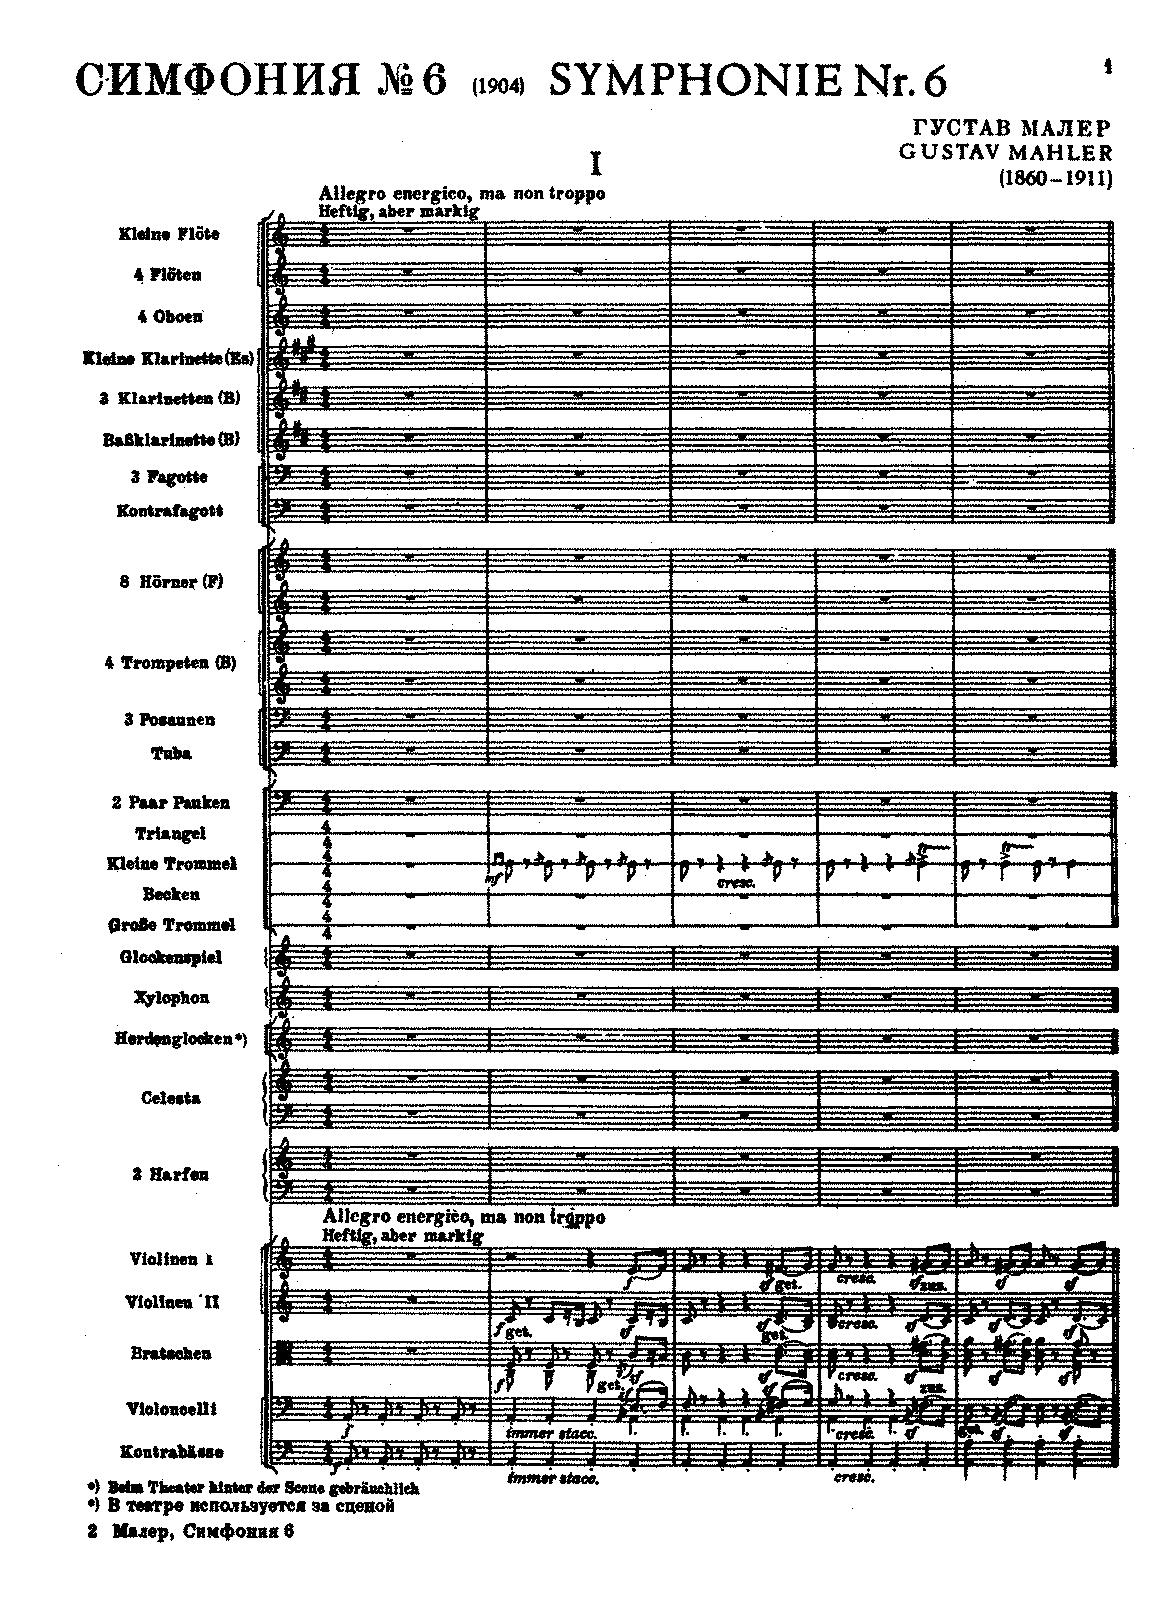 Mahler symphony 2 movement v essay